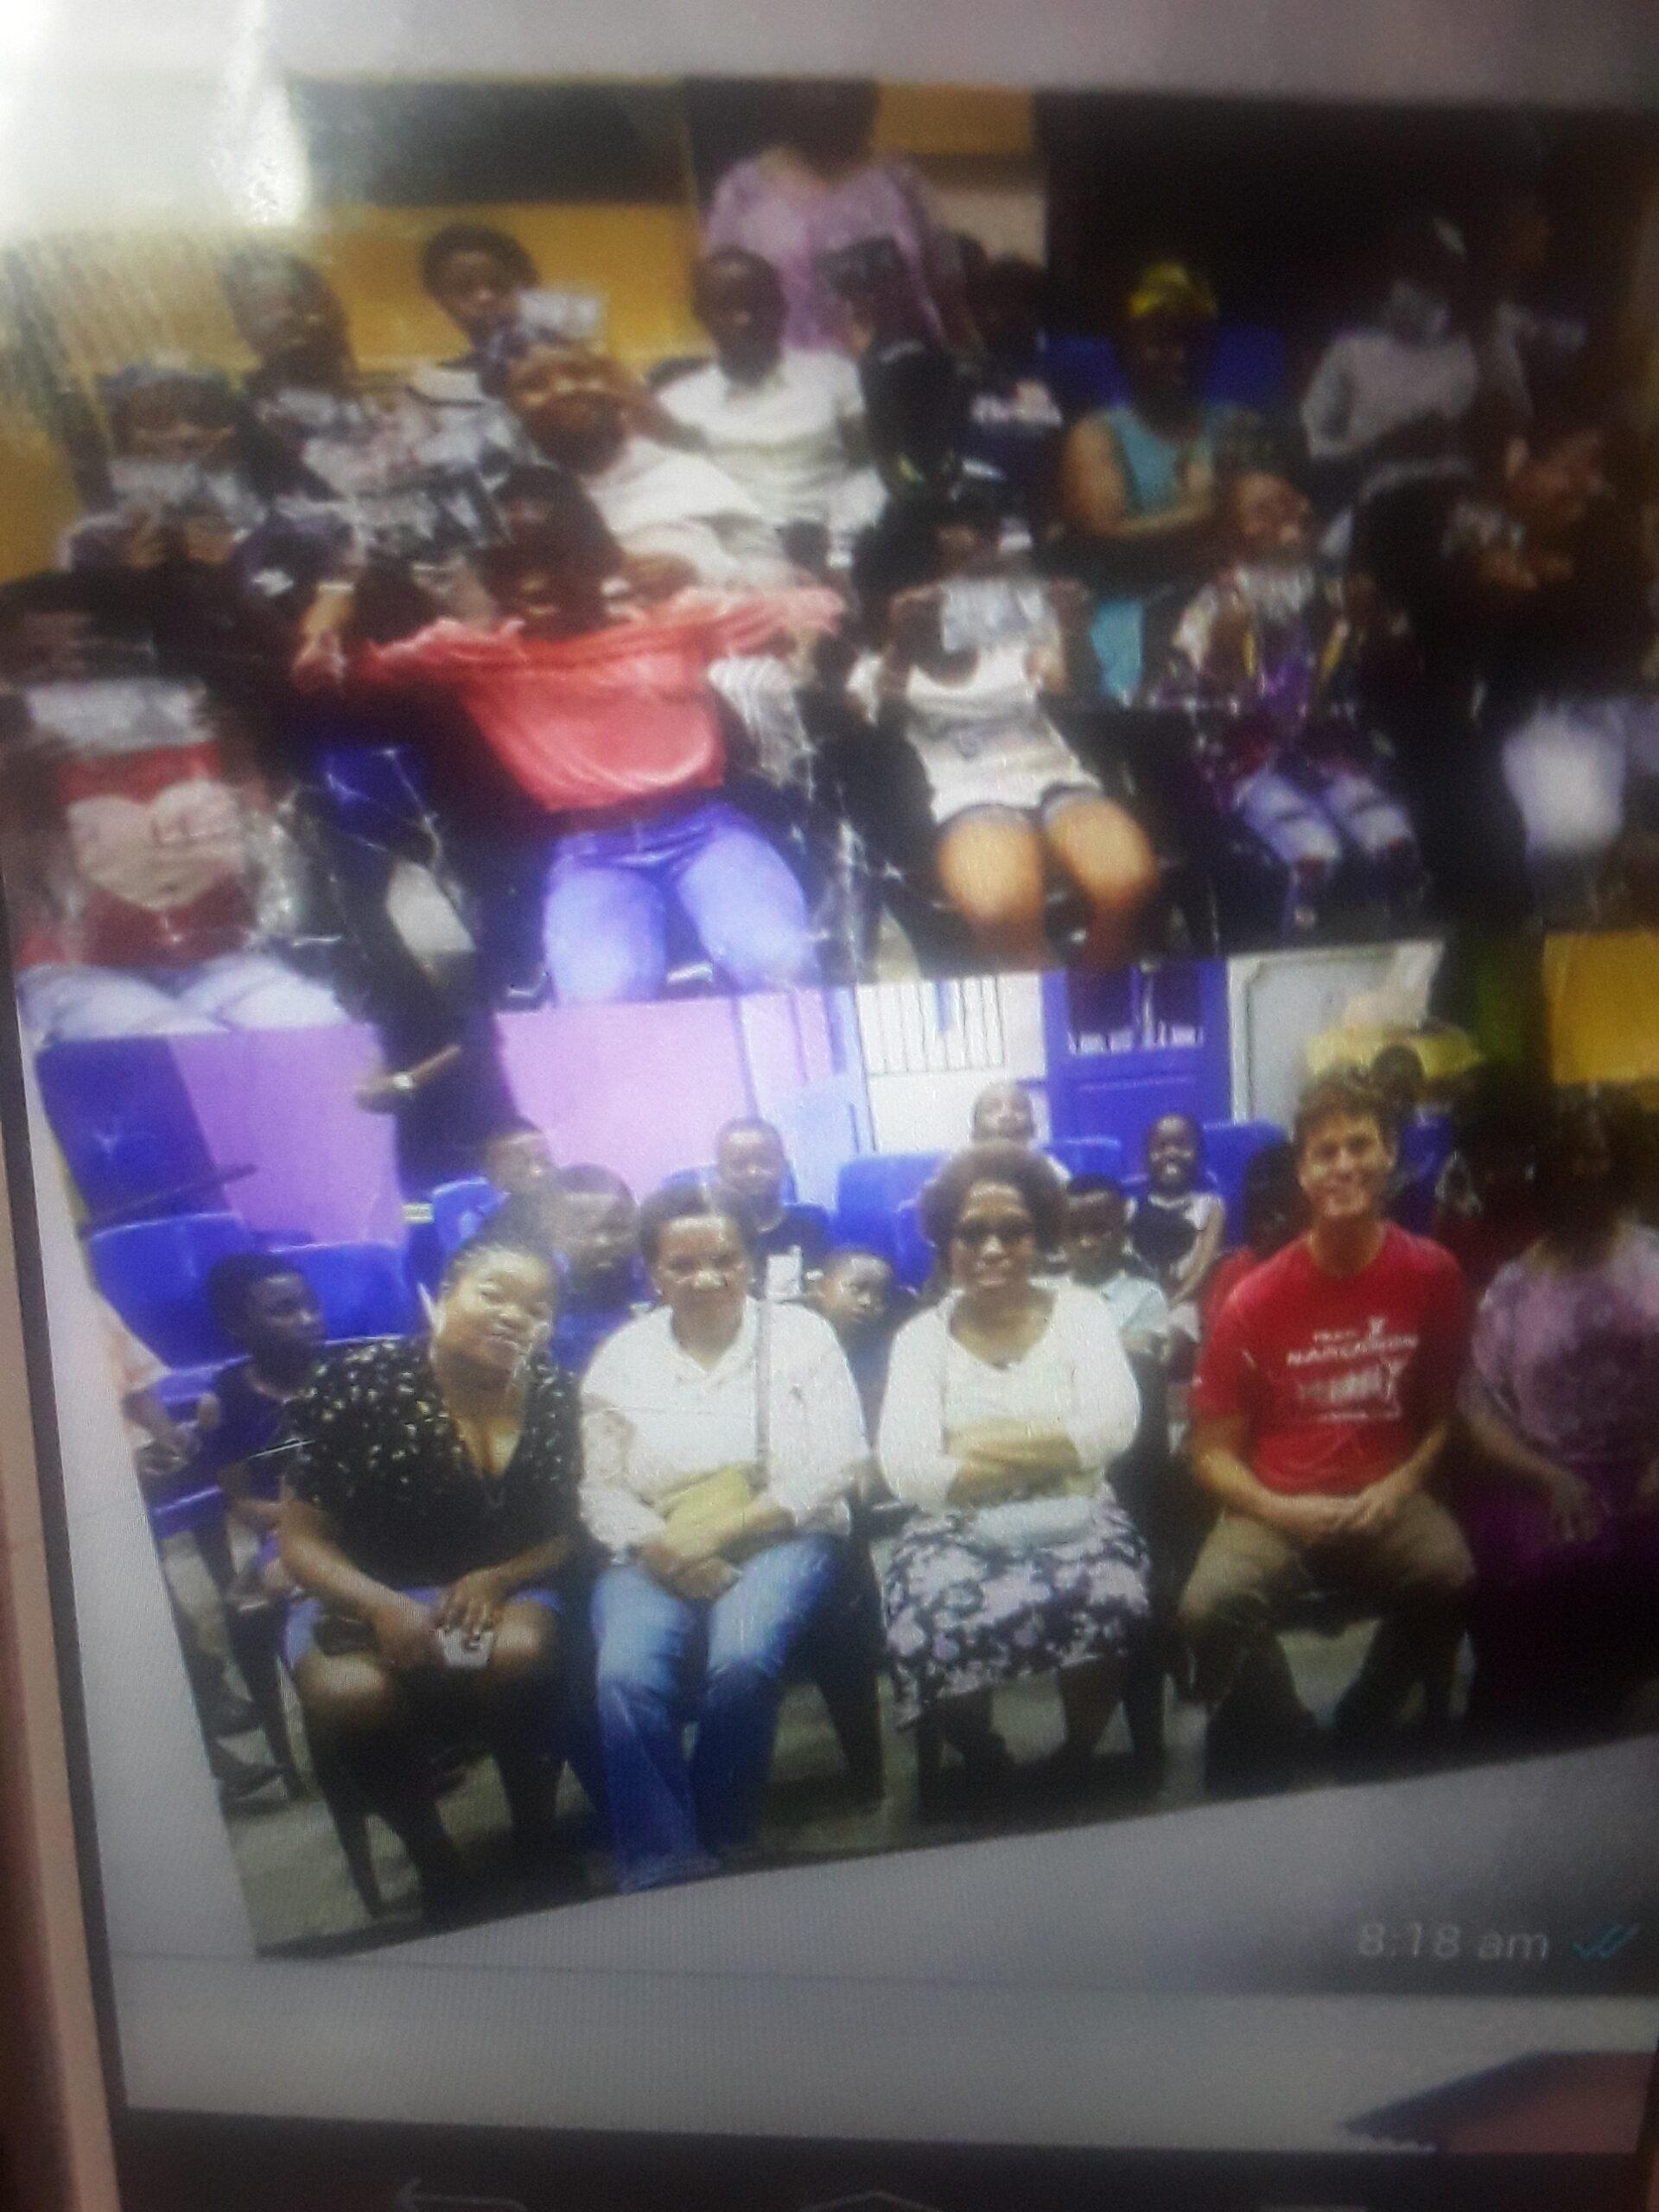 Mondis empowering organization, Mirriam Mondi, Cape Town, South Africa